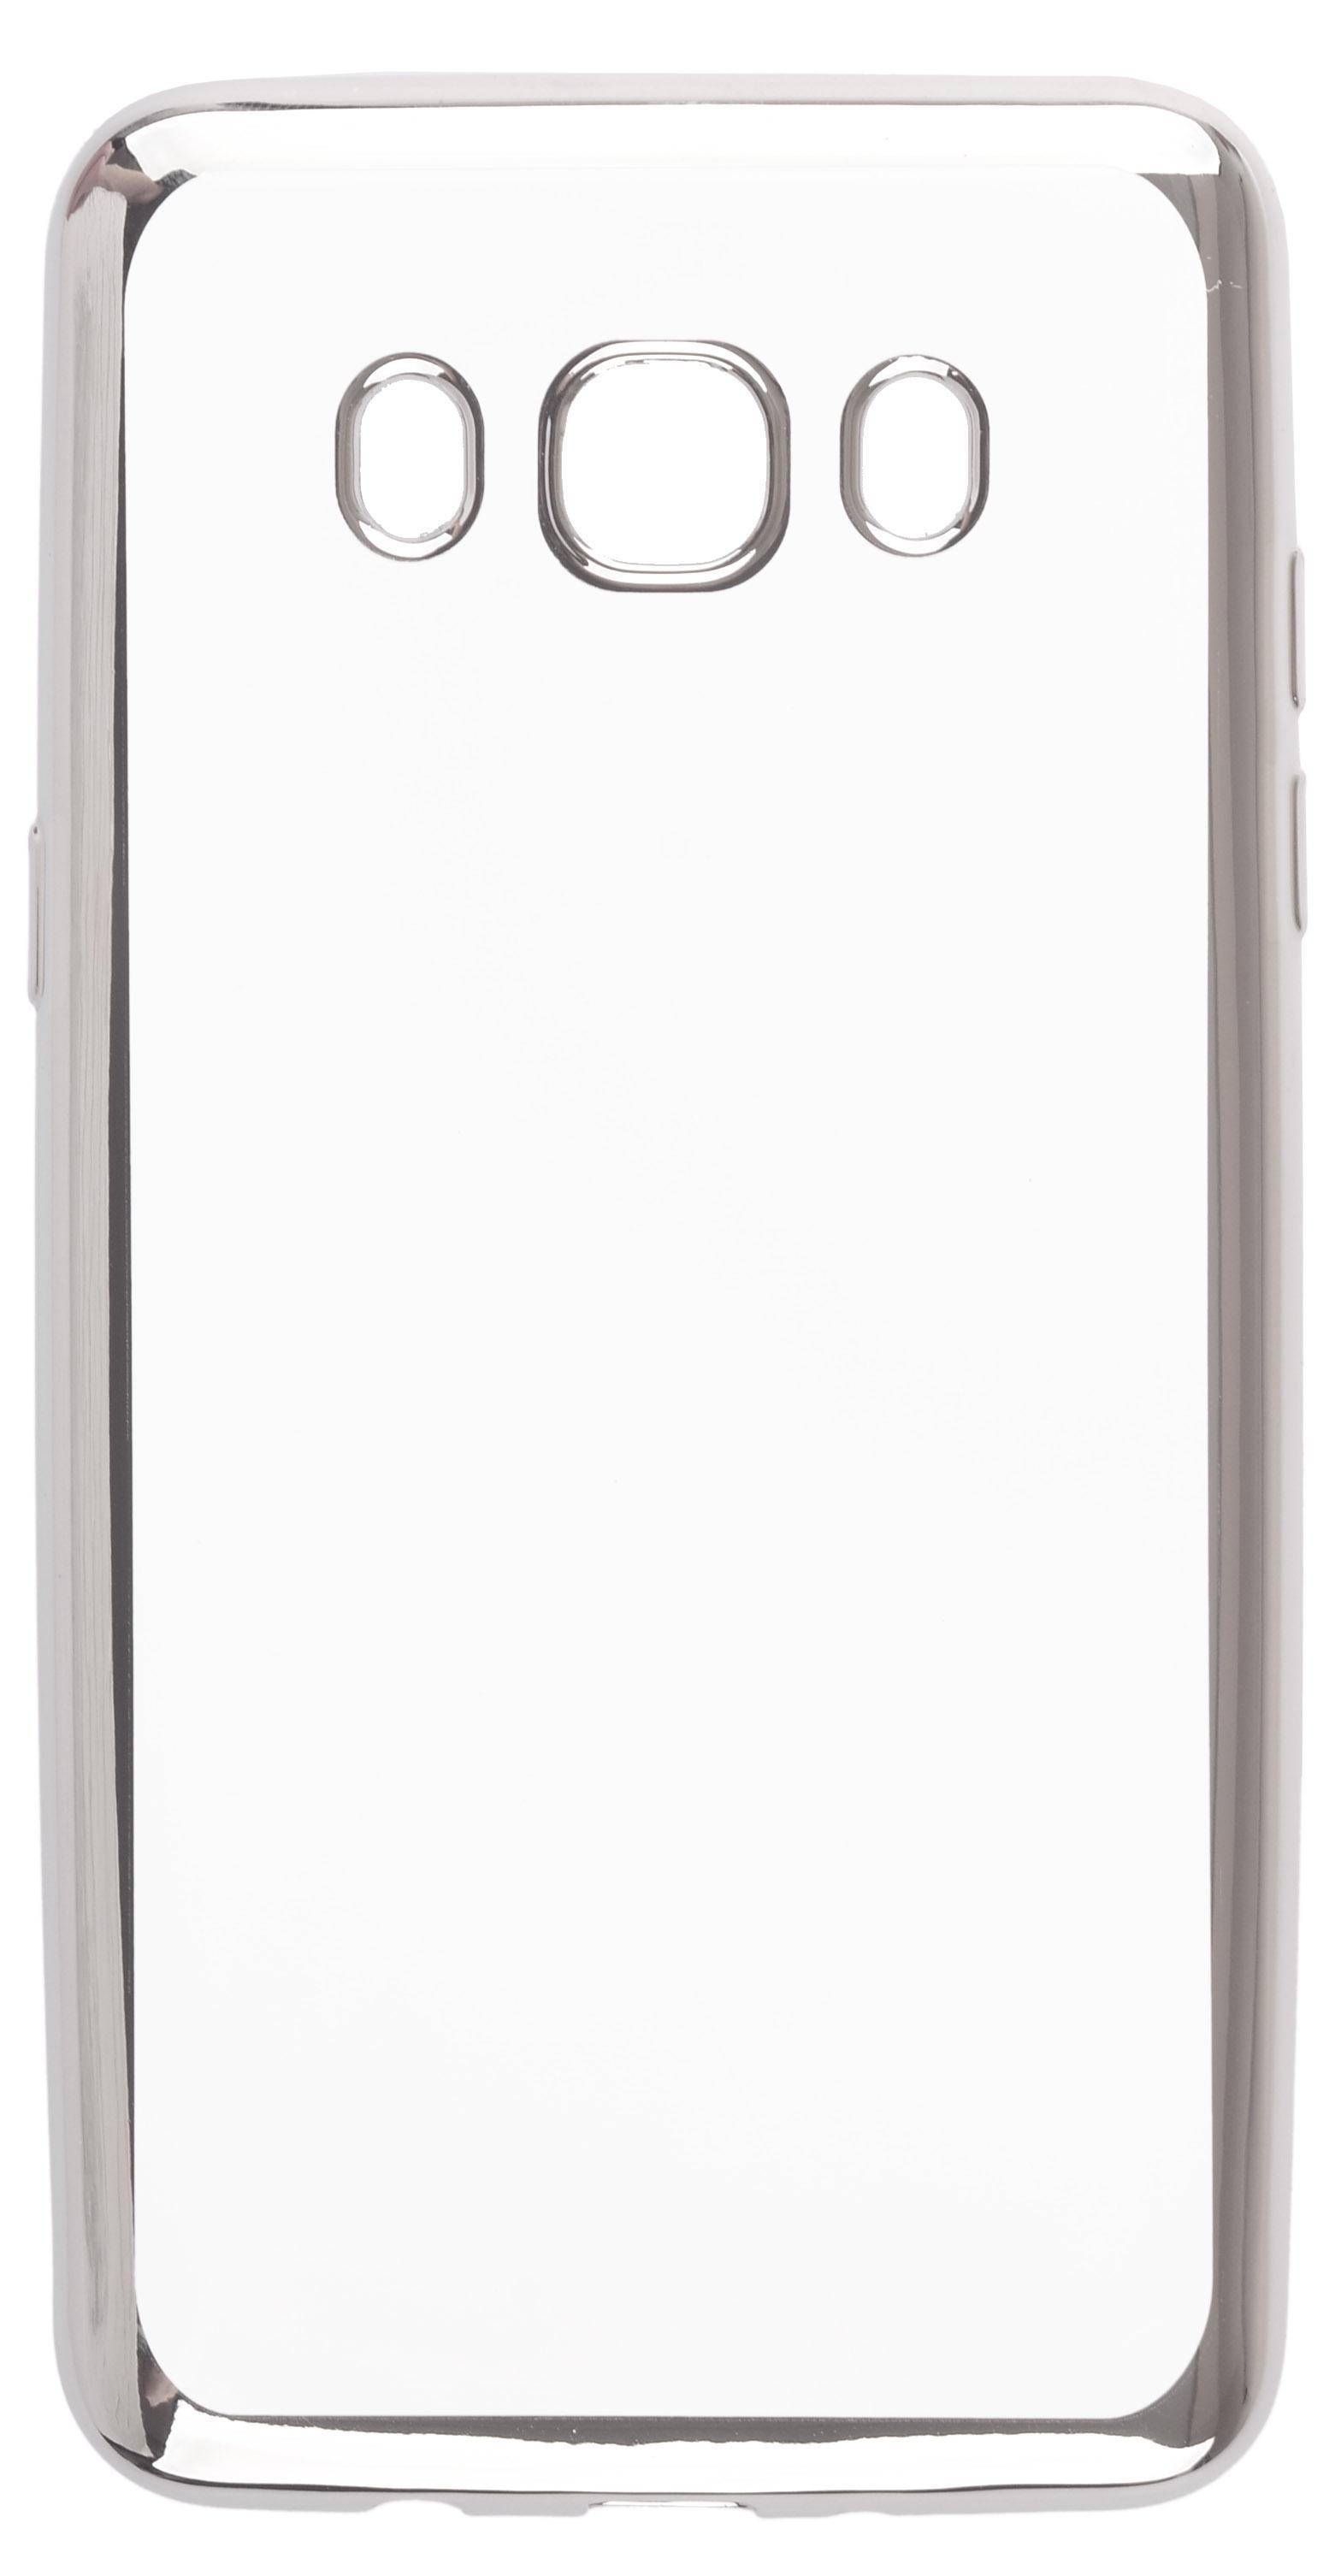 Чехол для сотового телефона skinBOX Silicone chrome border, 4630042528697, серебристый чехол для сотового телефона skinbox silicone chrome border 4630042528697 серебристый